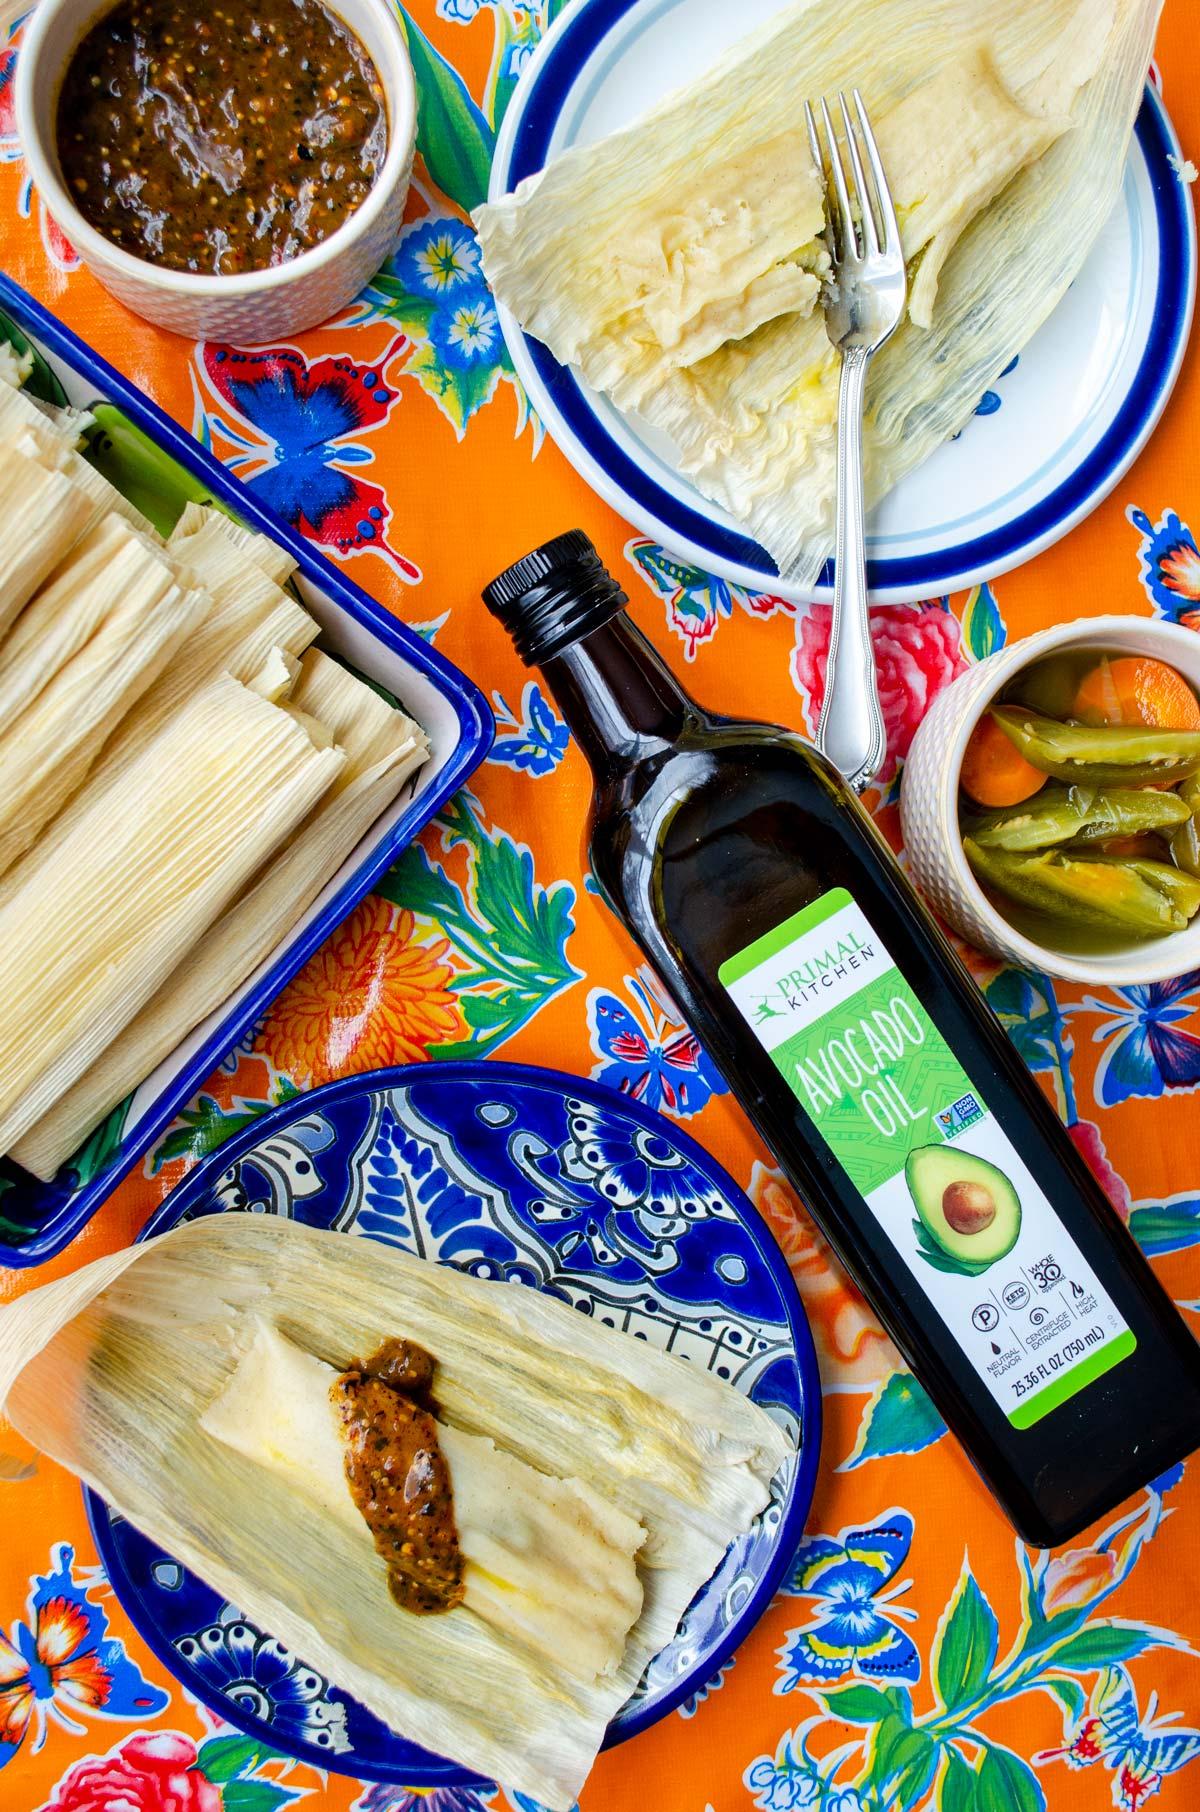 orange table cloth cheese and jalapeño tamales